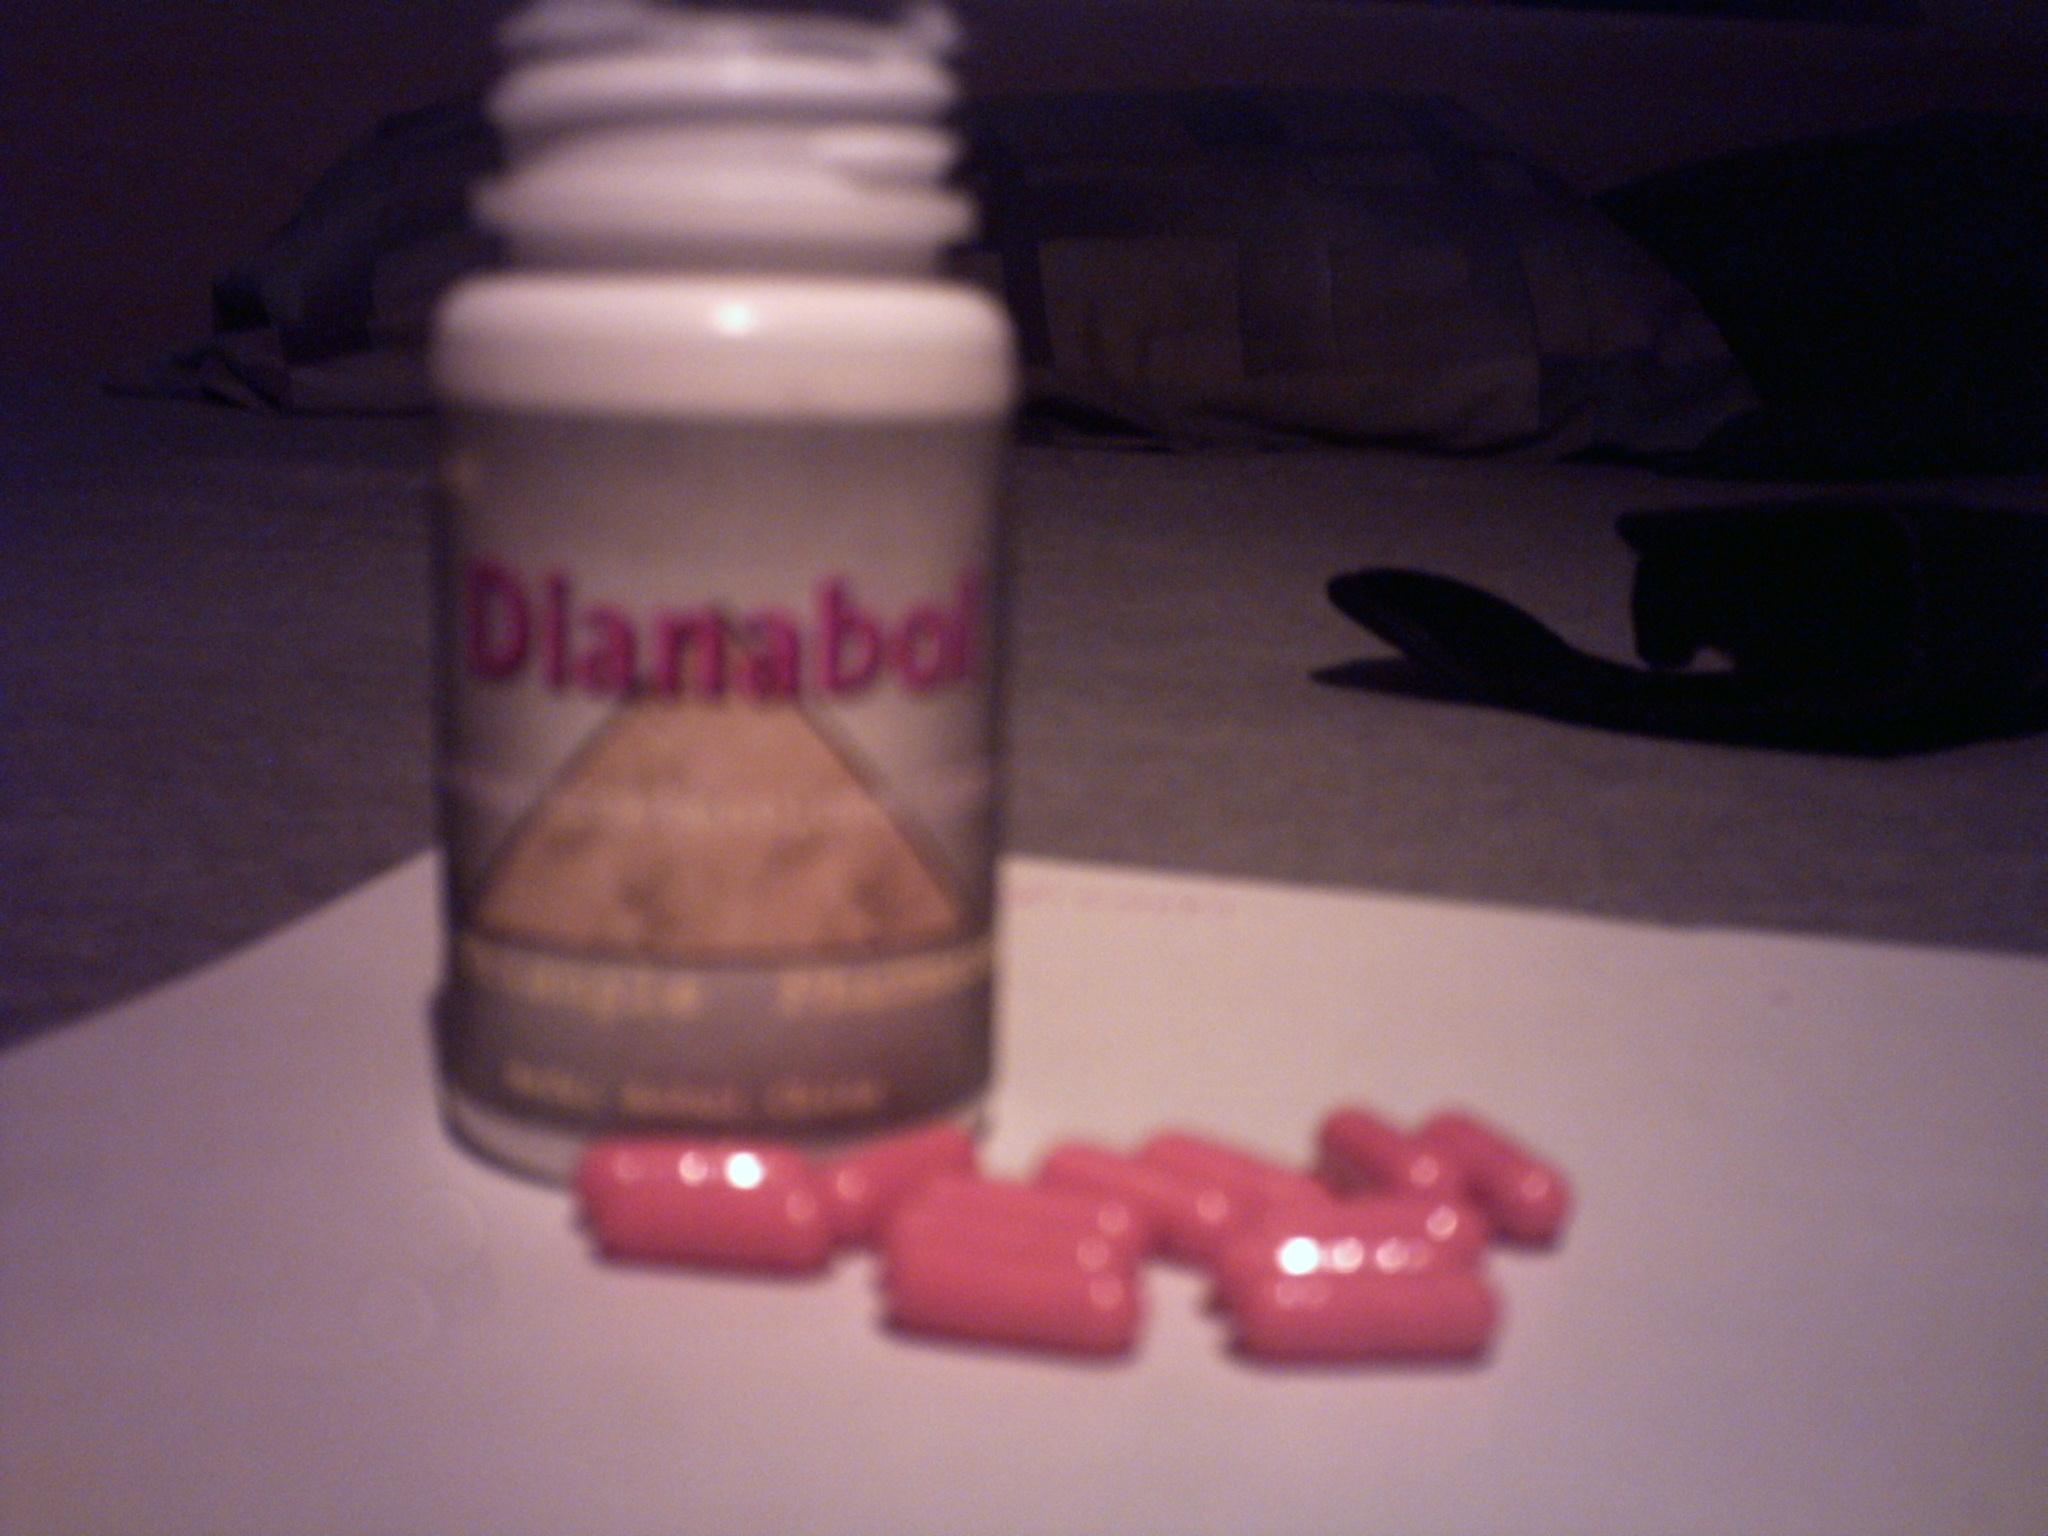 real dbol steroids